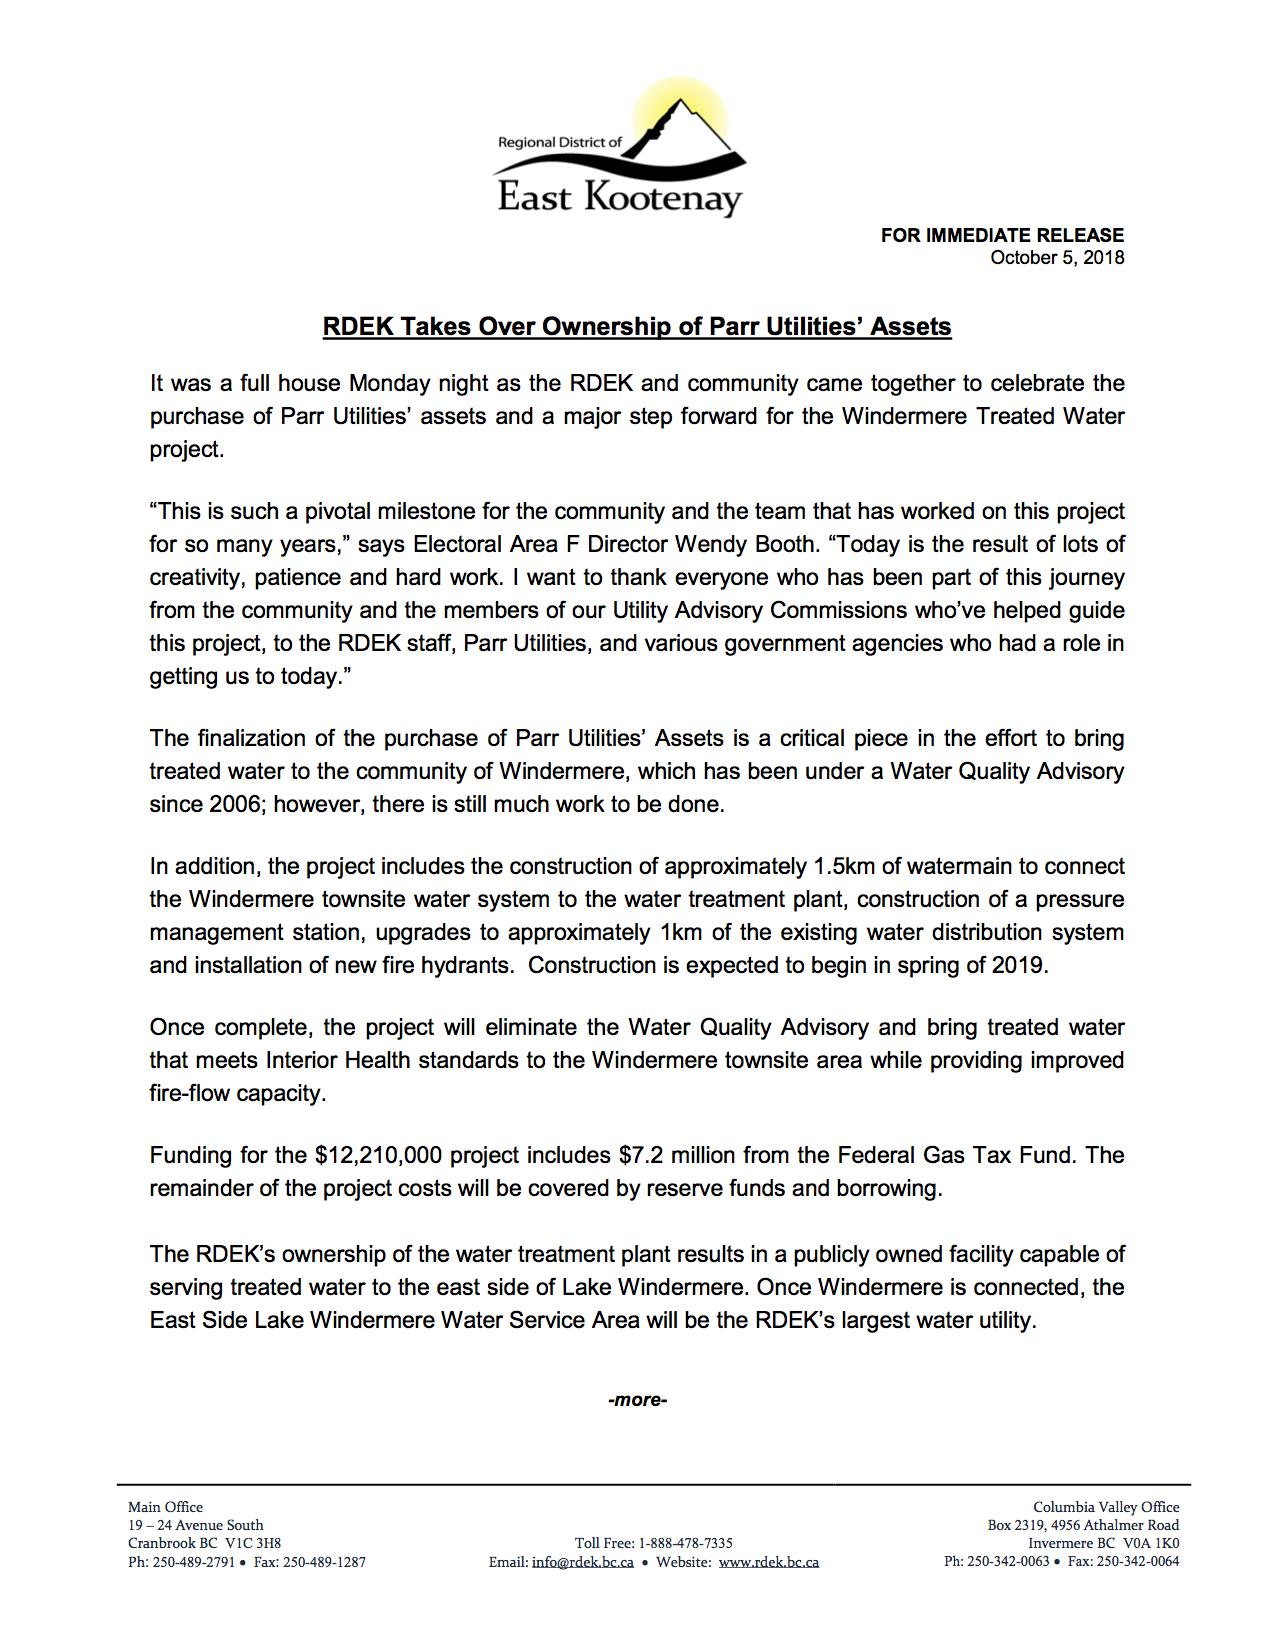 18.10.04 Community Celebration as RDEK Takes Over Ownership of Parr Utilities Assets.jpg